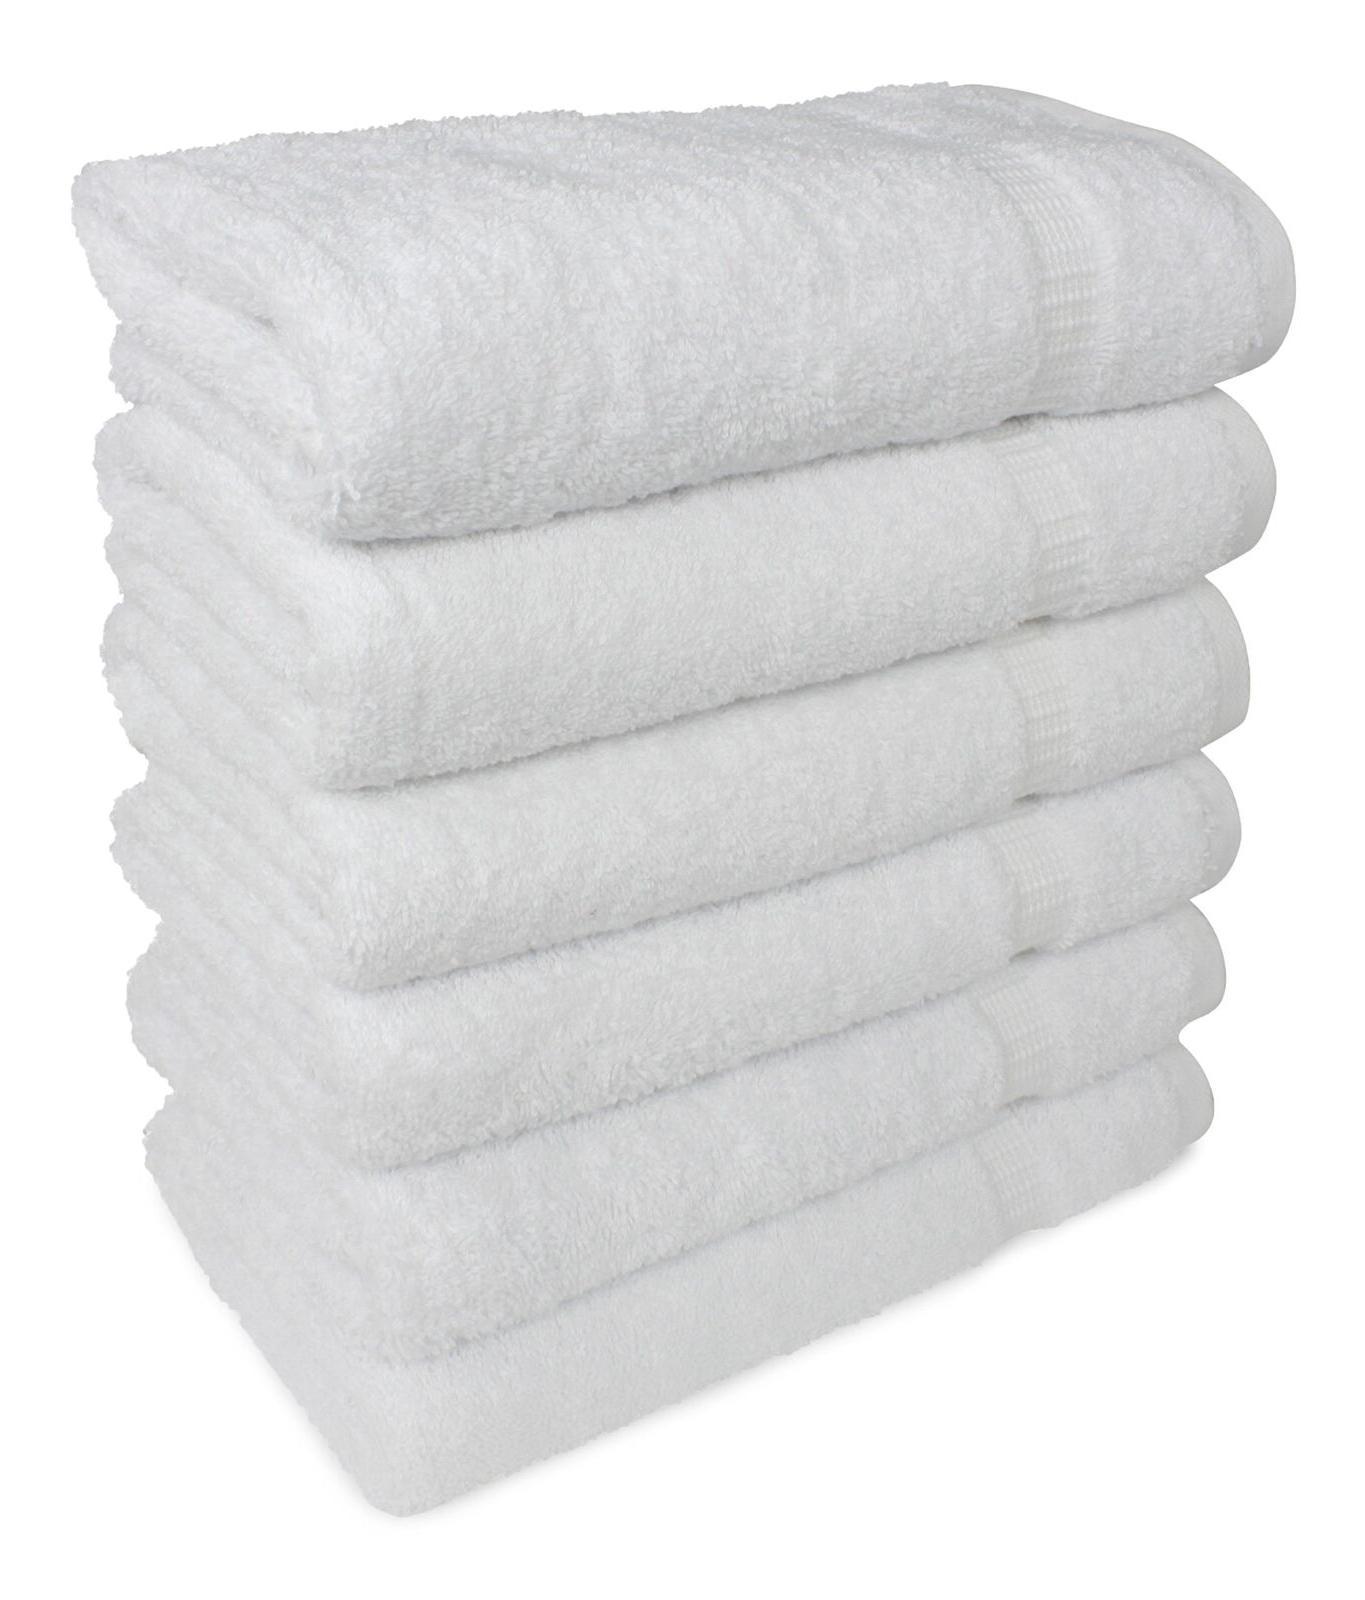 Spa Turkish Cotton 6-Piece Eco-Friendly Hand